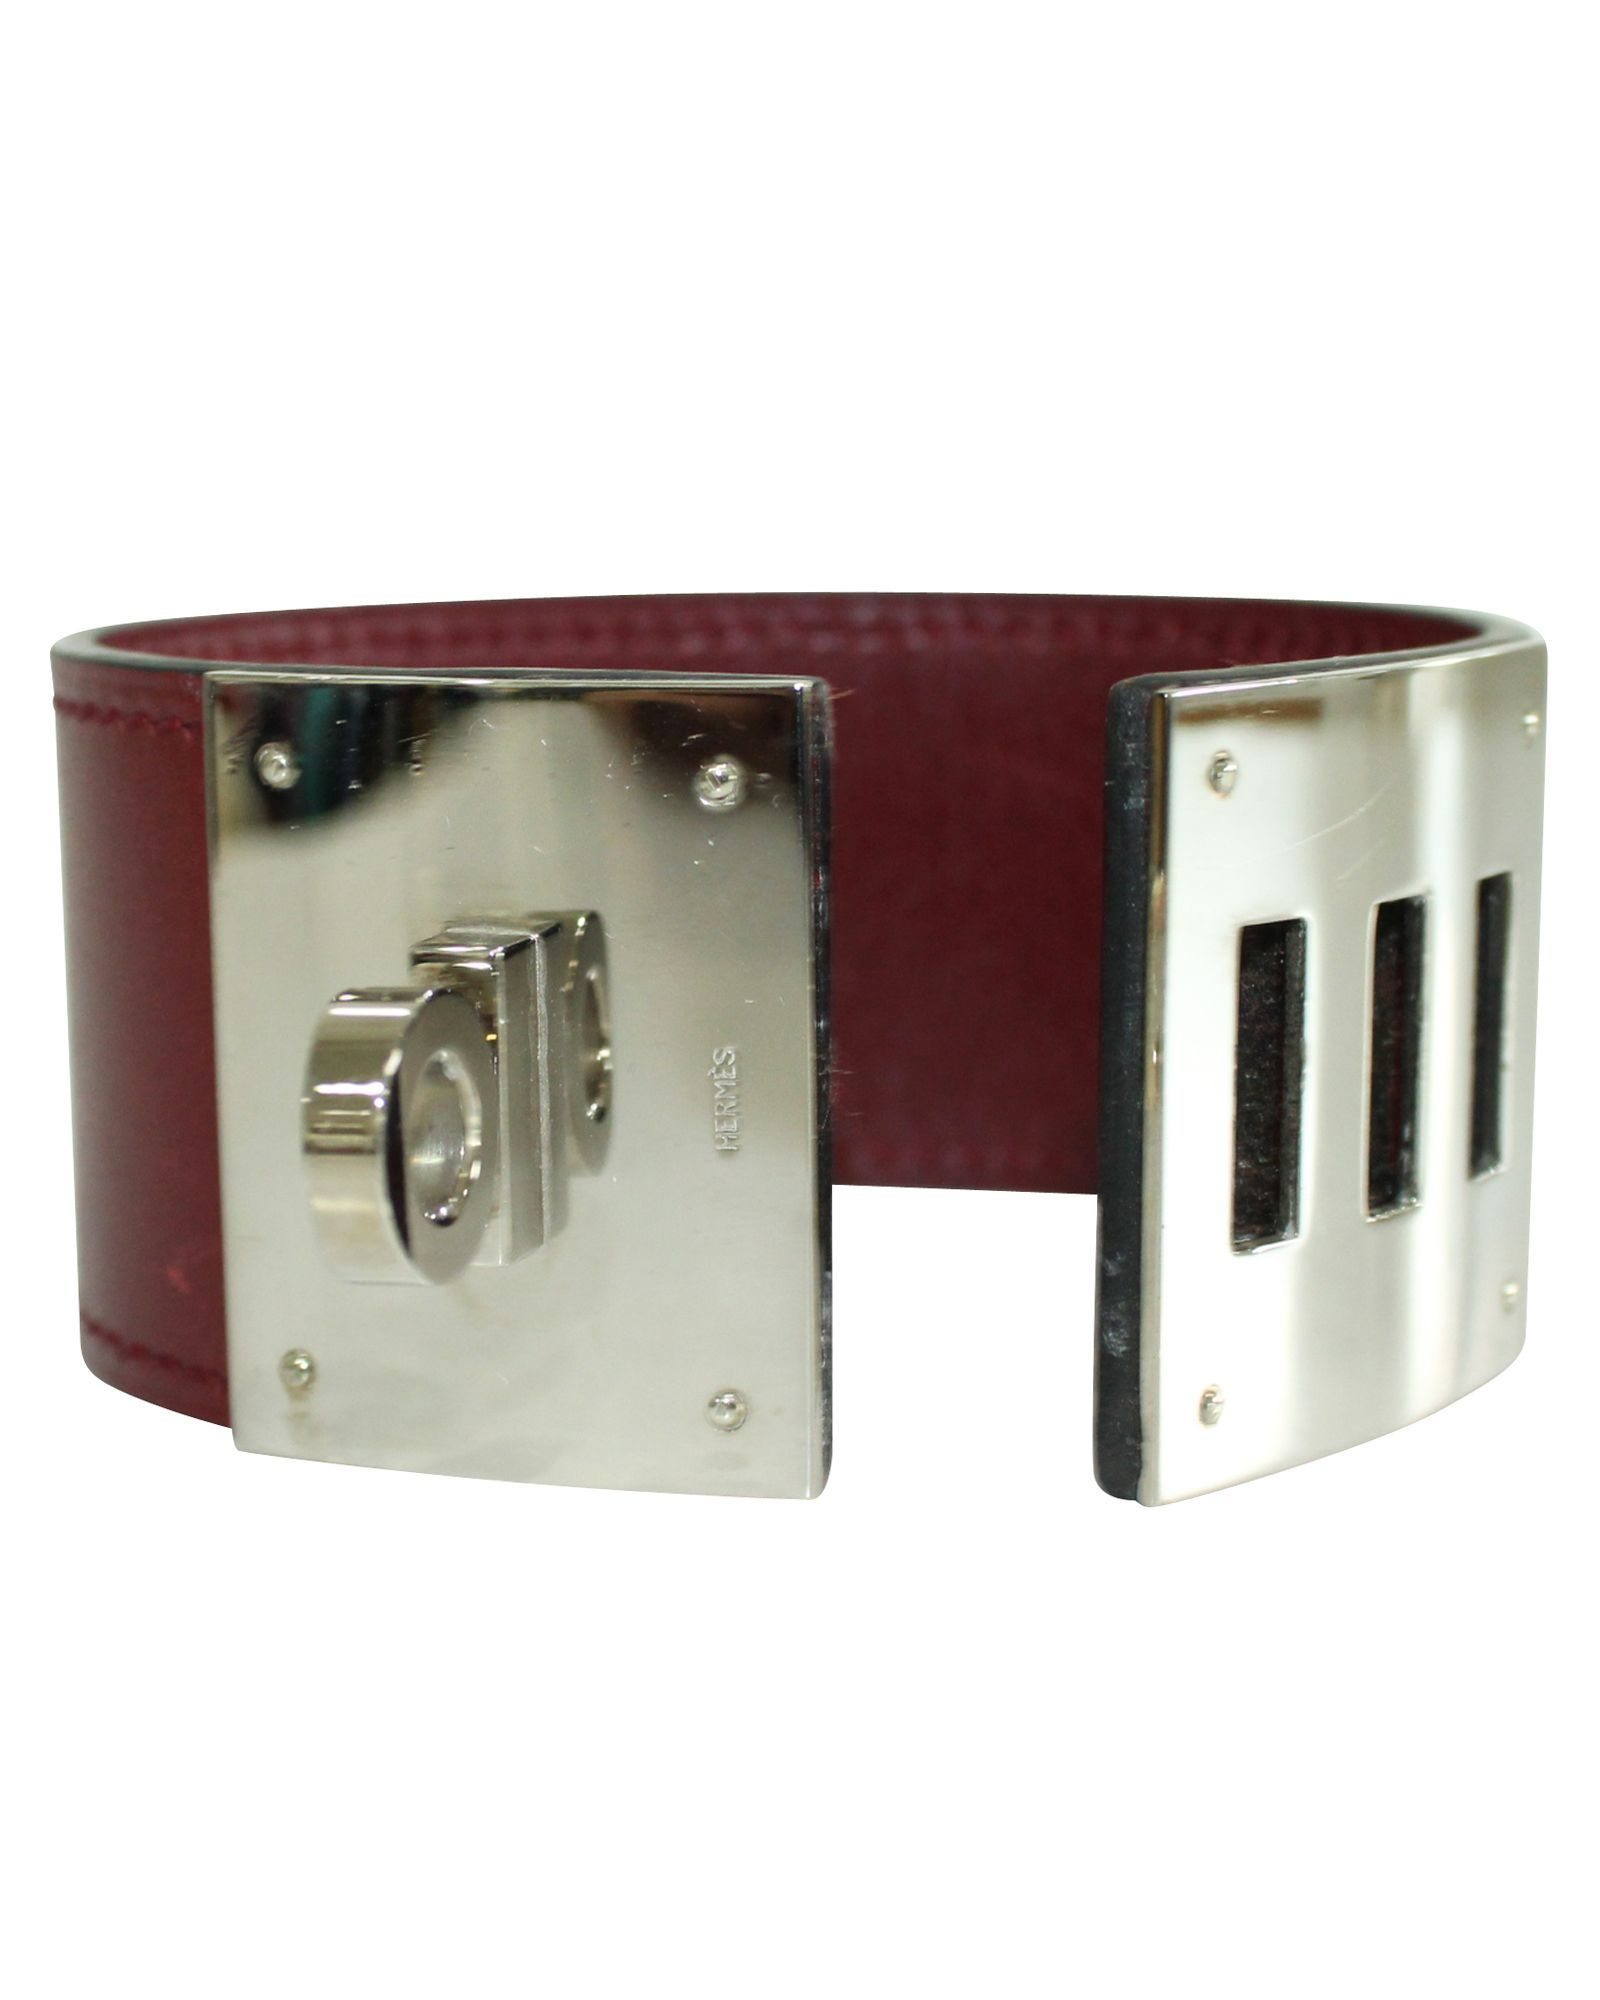 Hermès Kelly Dog Bracelet -Pre Owned Condition Good